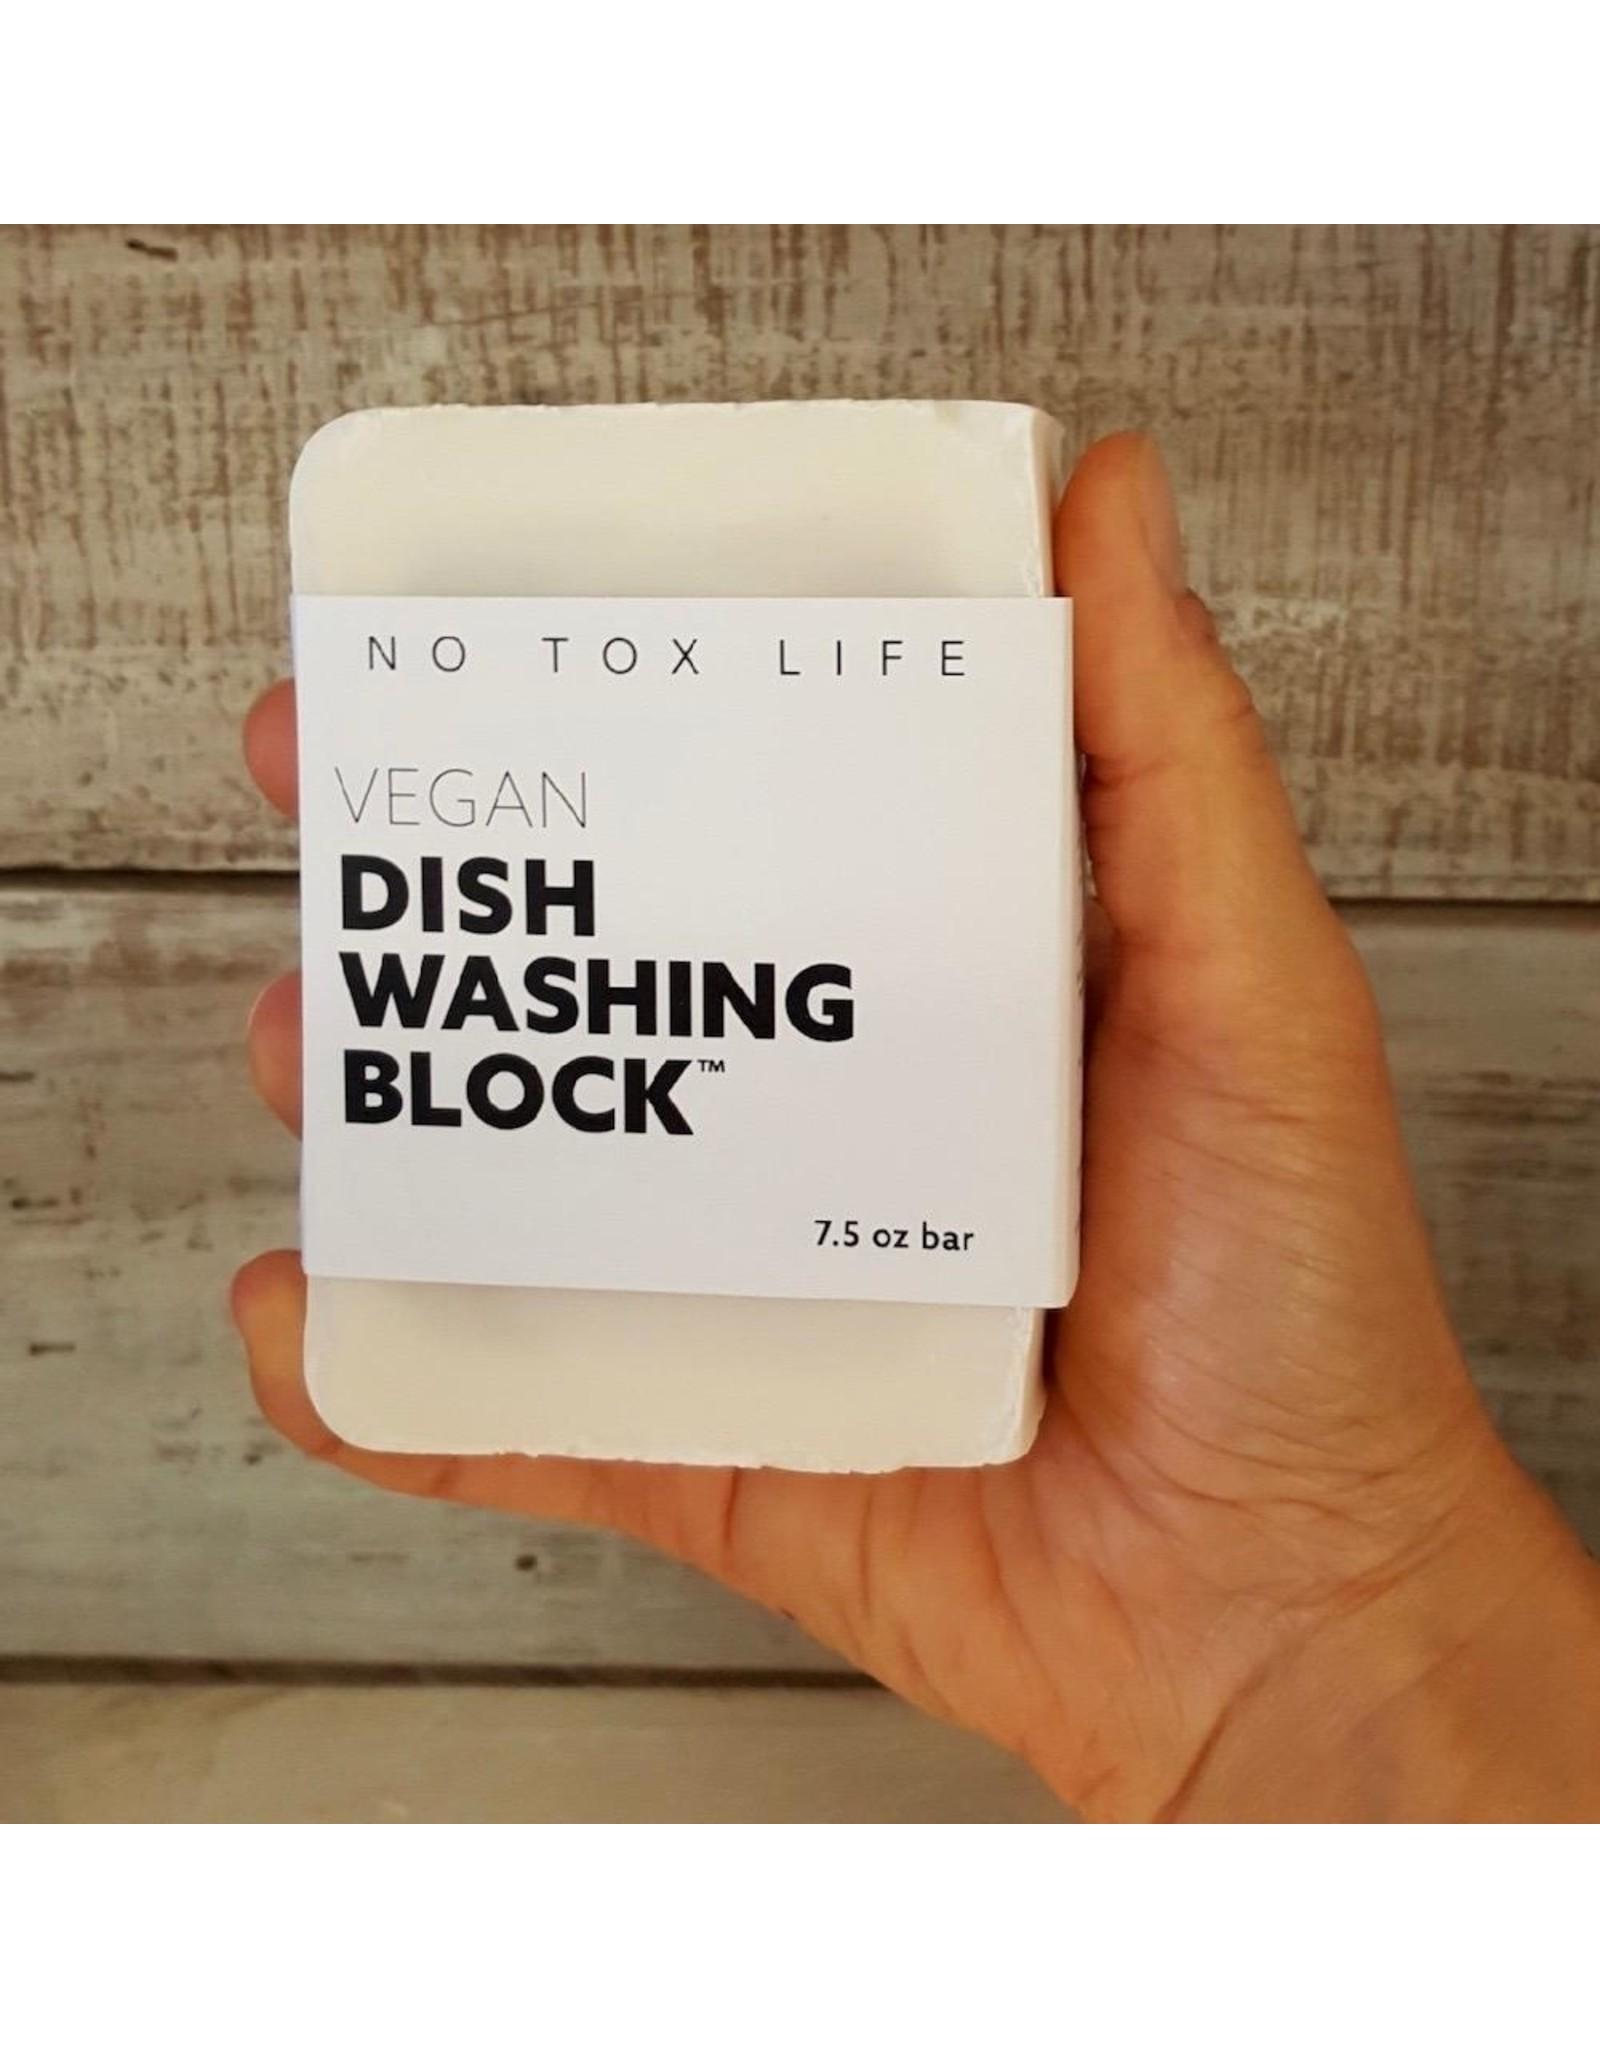 No Tox Life Zero Waste Dish Washing Block 7.5oz